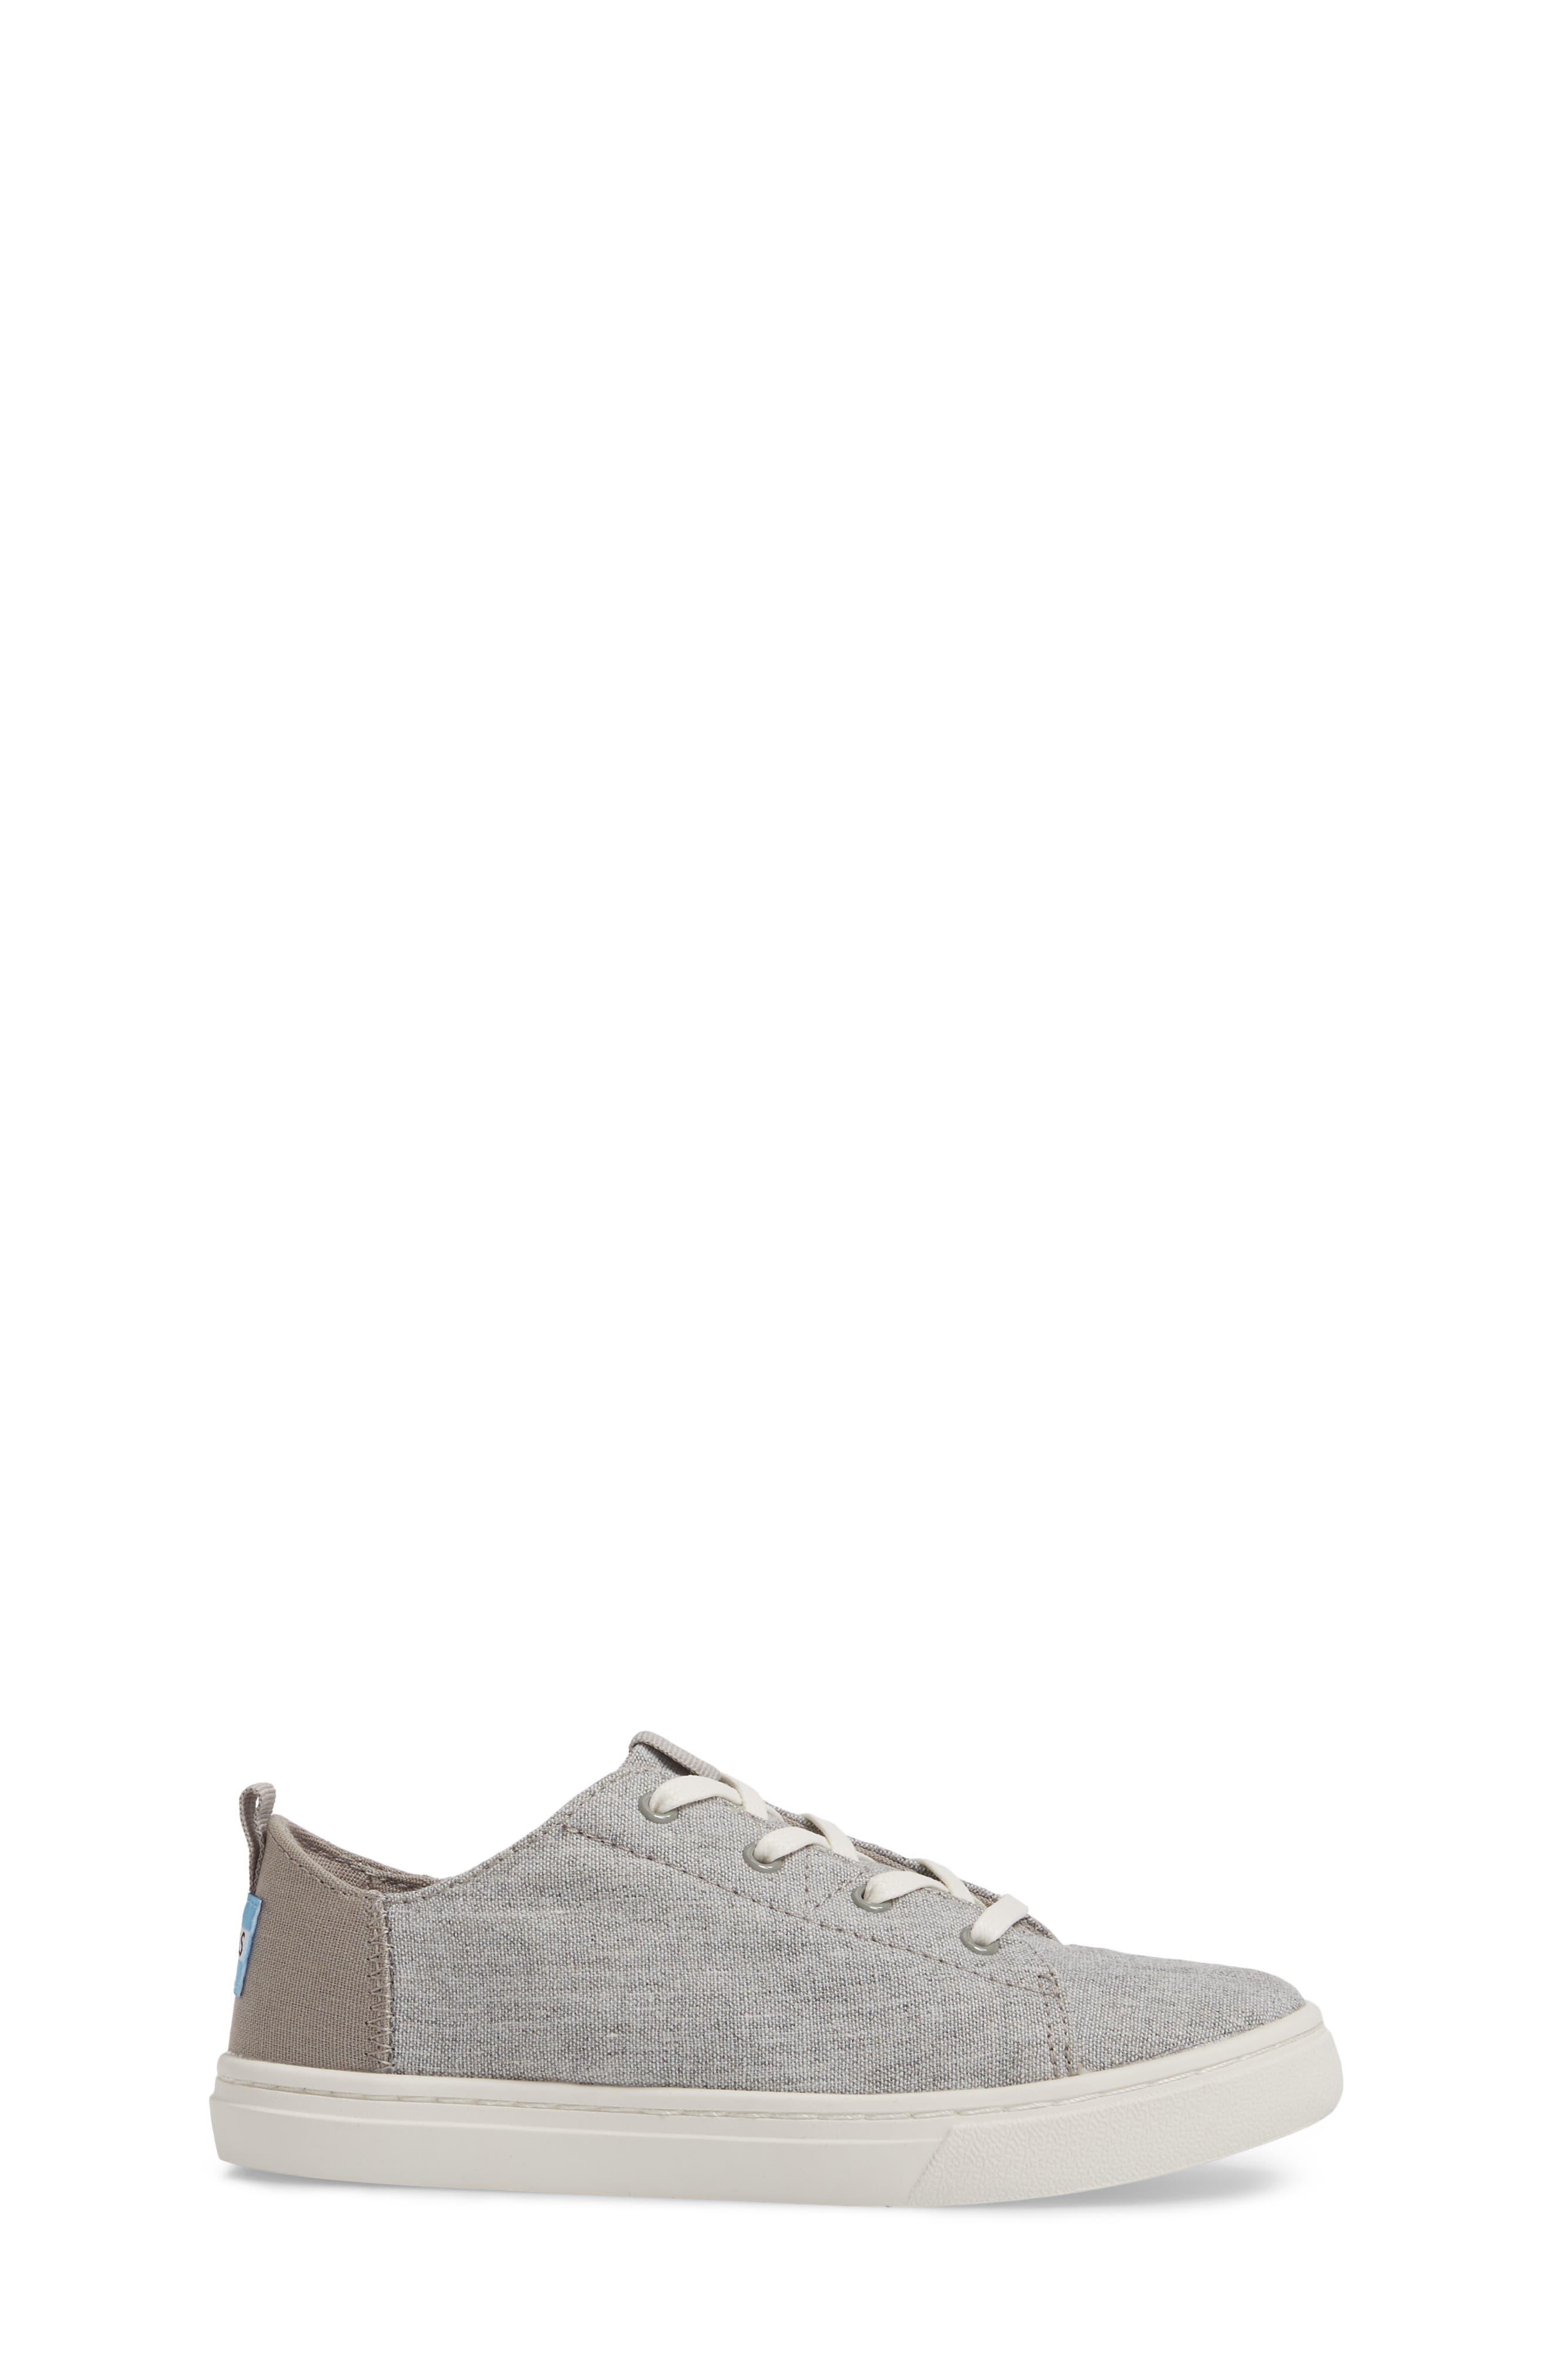 Lenny Sneaker,                             Alternate thumbnail 3, color,                             Drizzle Grey Slub Chambray